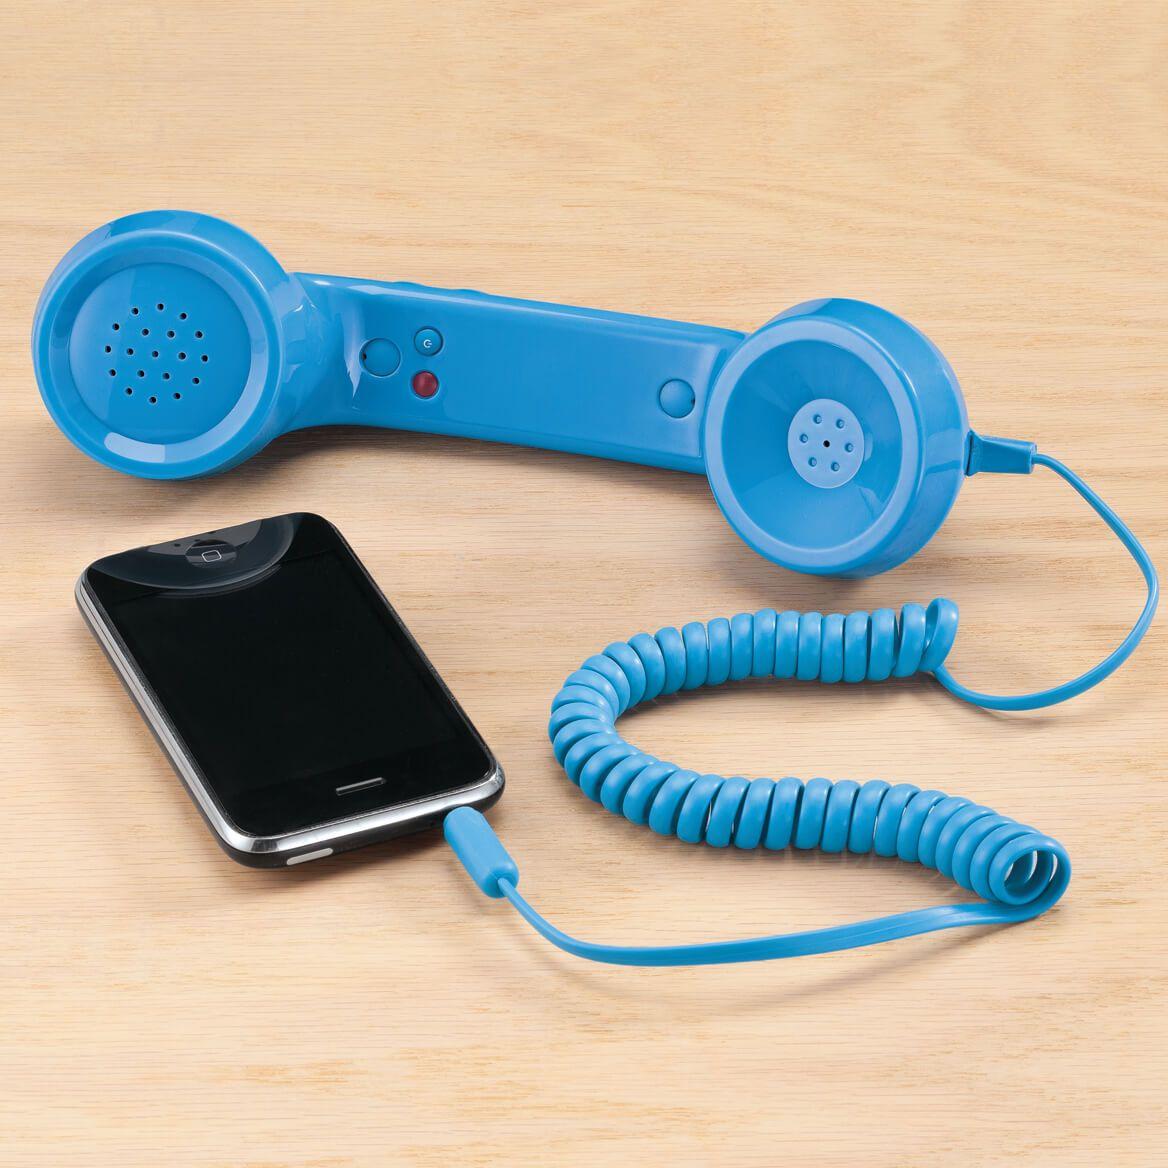 Retro Phone Handset-346131